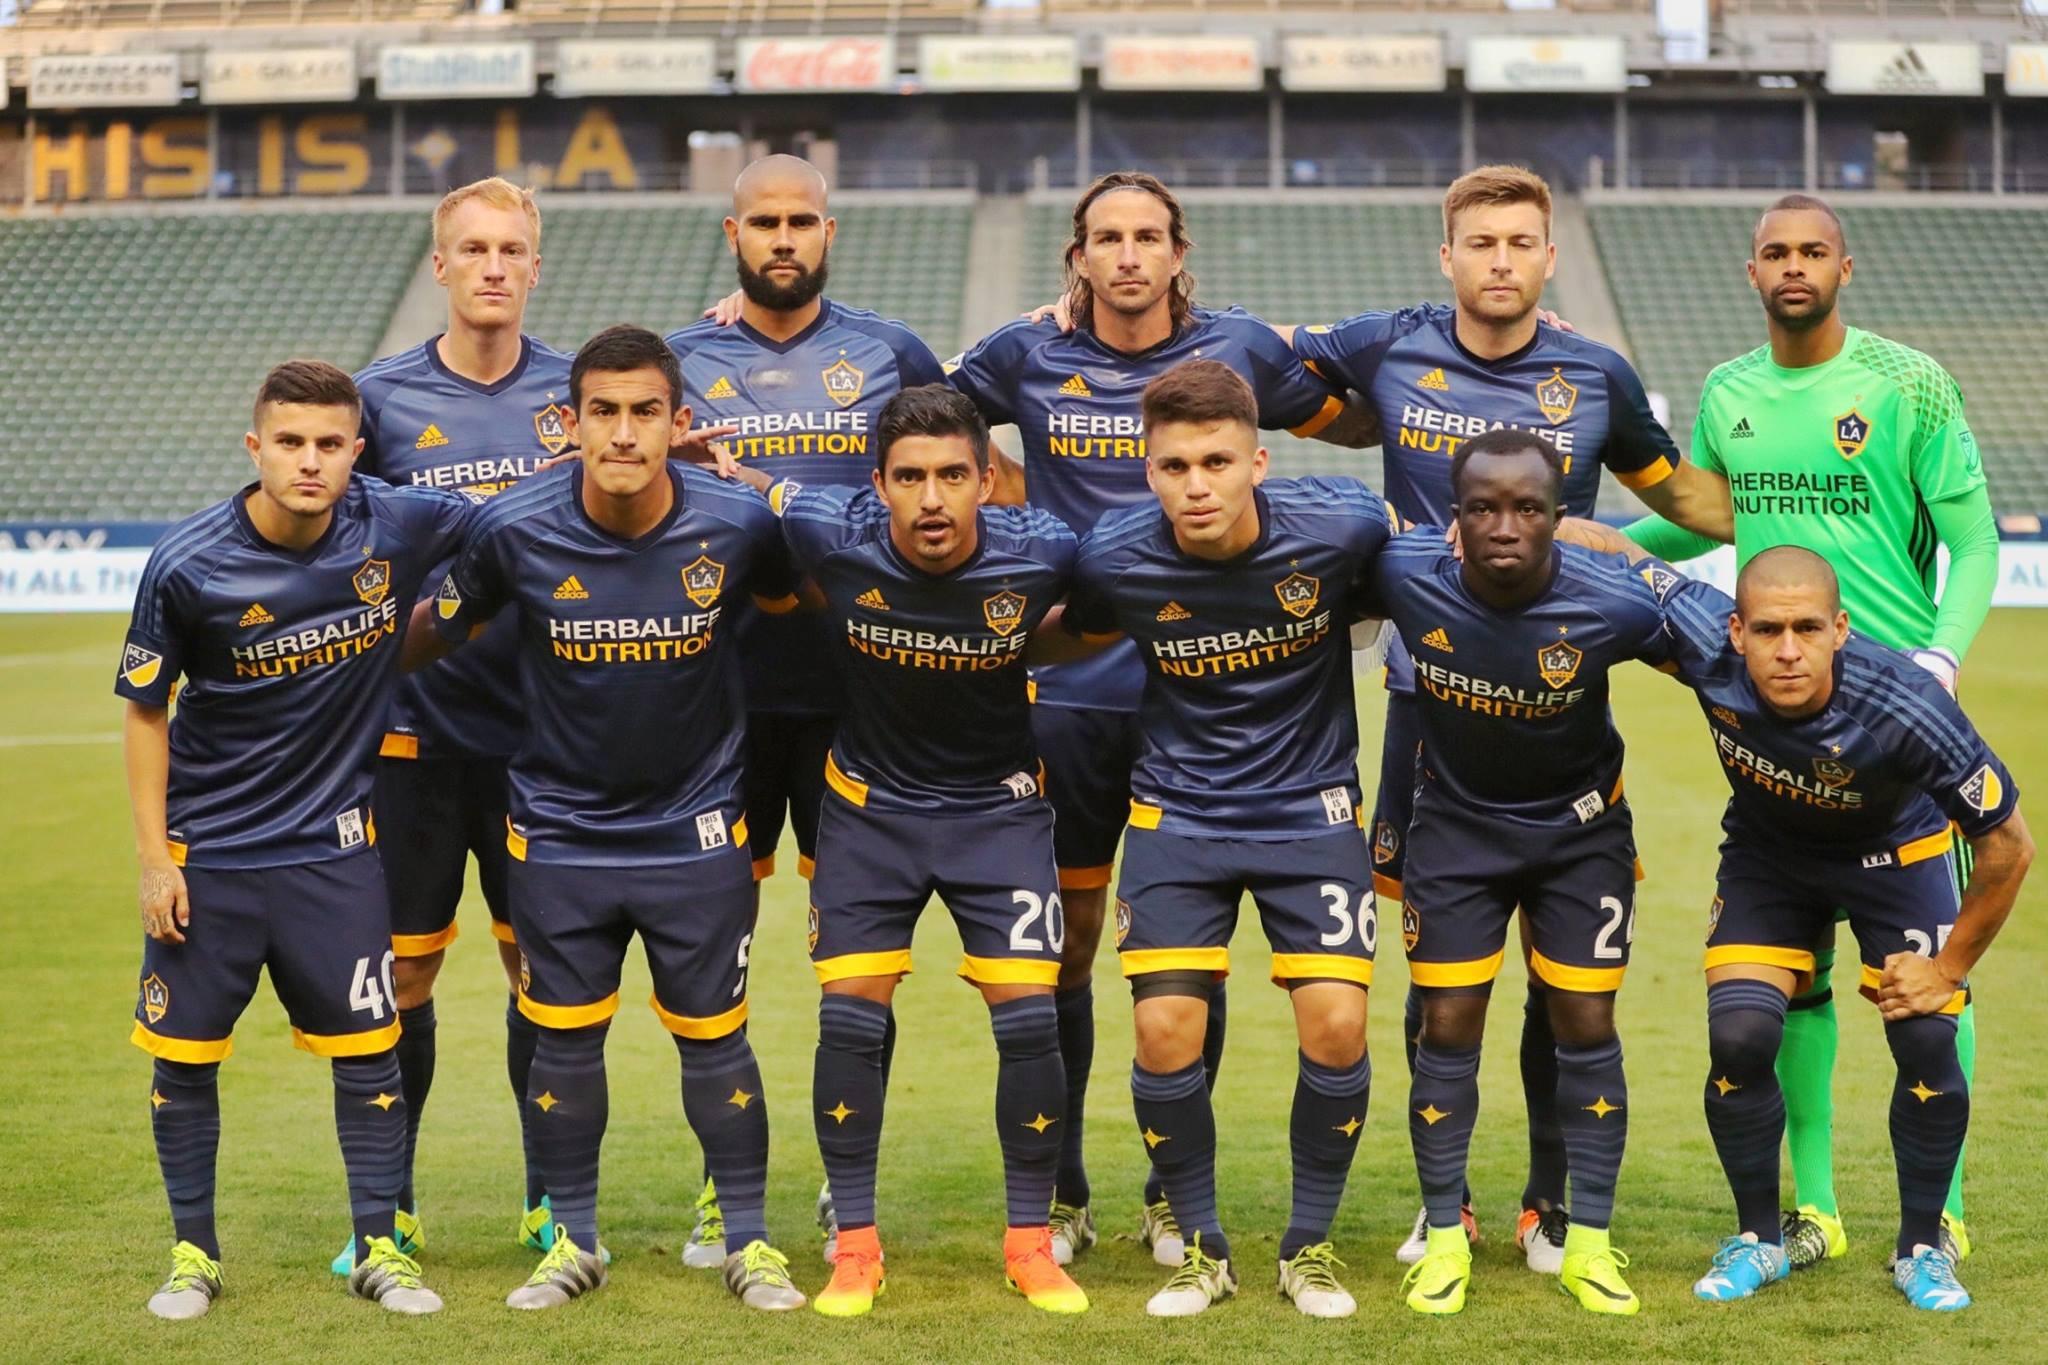 US Open Cup: LA Galaxy Defeat LA Maquina On Controversial Goal